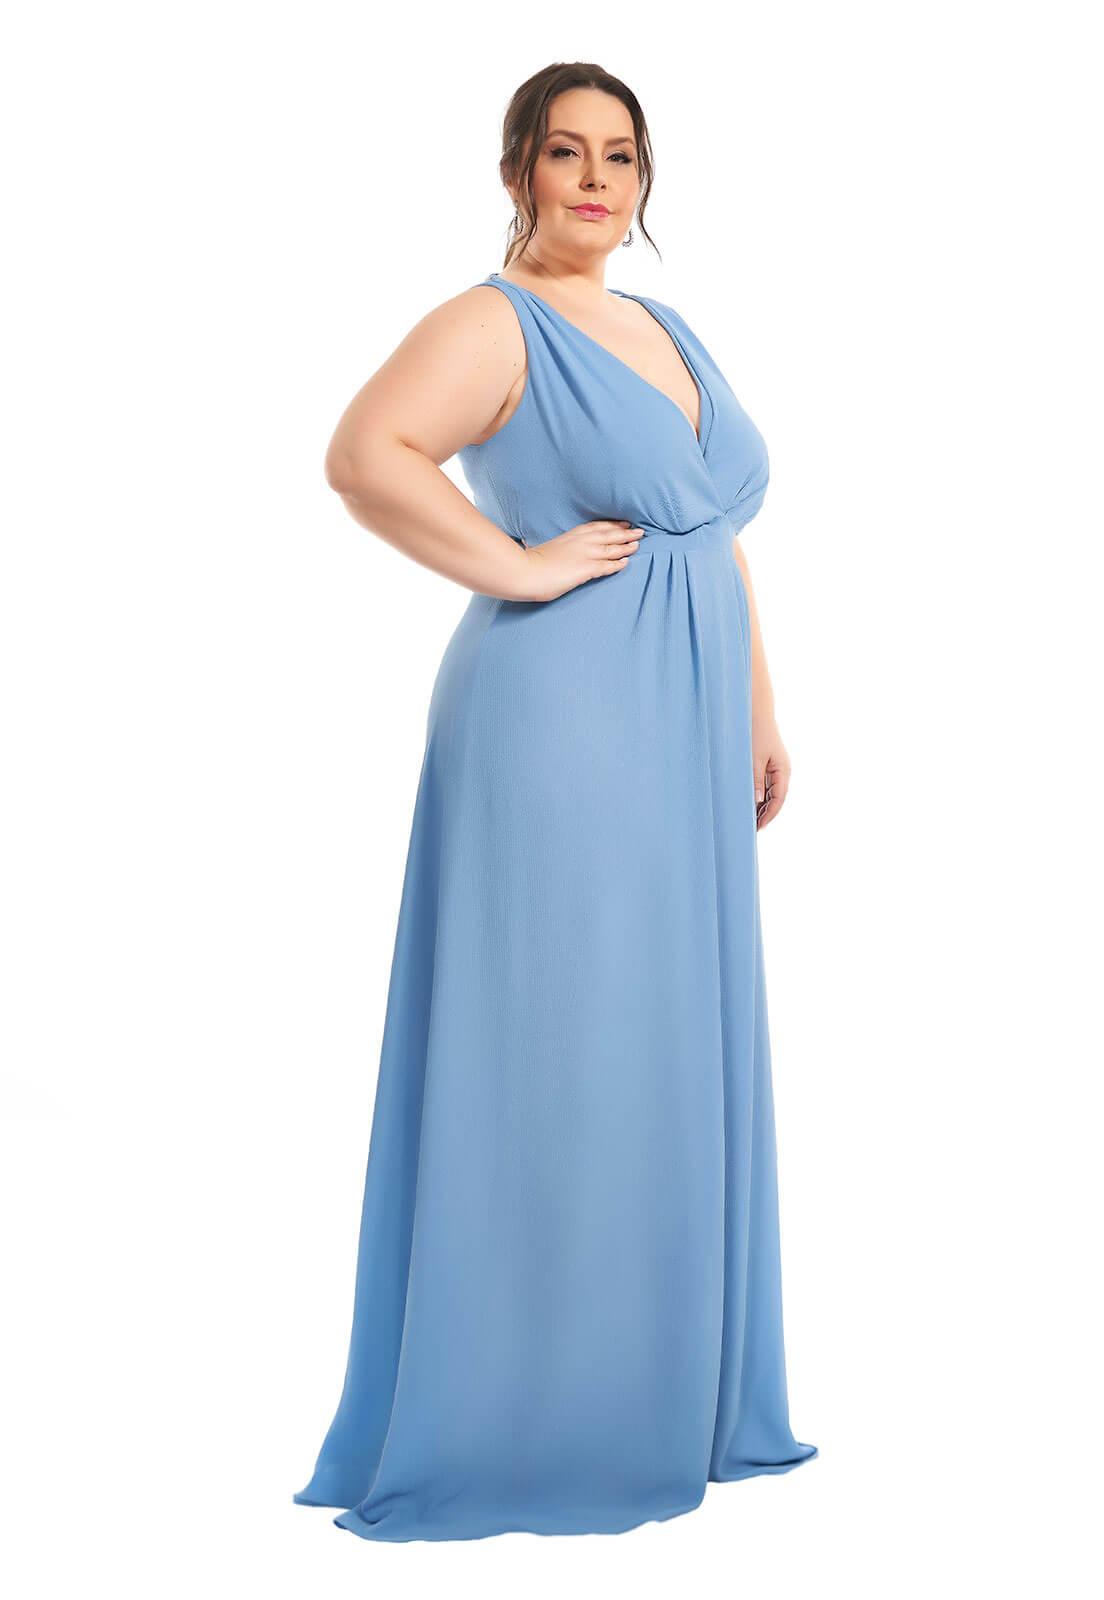 Vestido Plus Size Azul Serenity